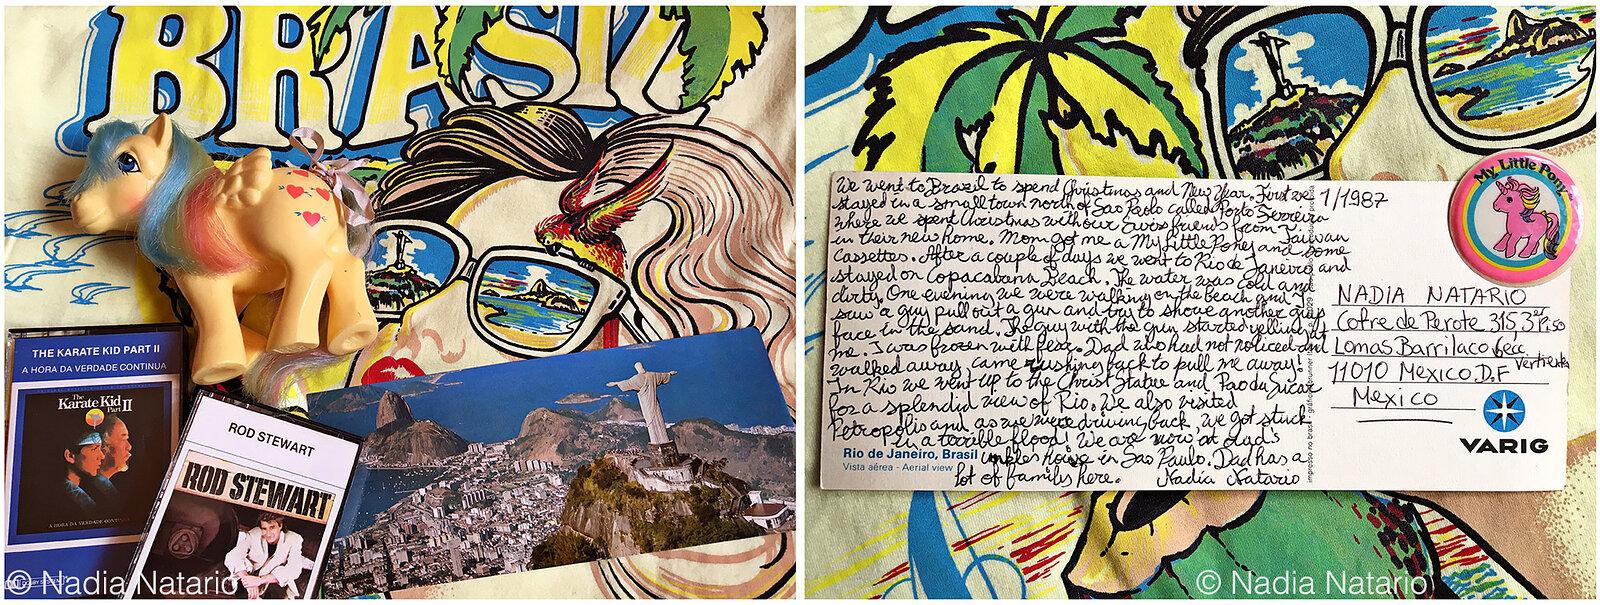 Postcards to Myself - Brazil, 1987